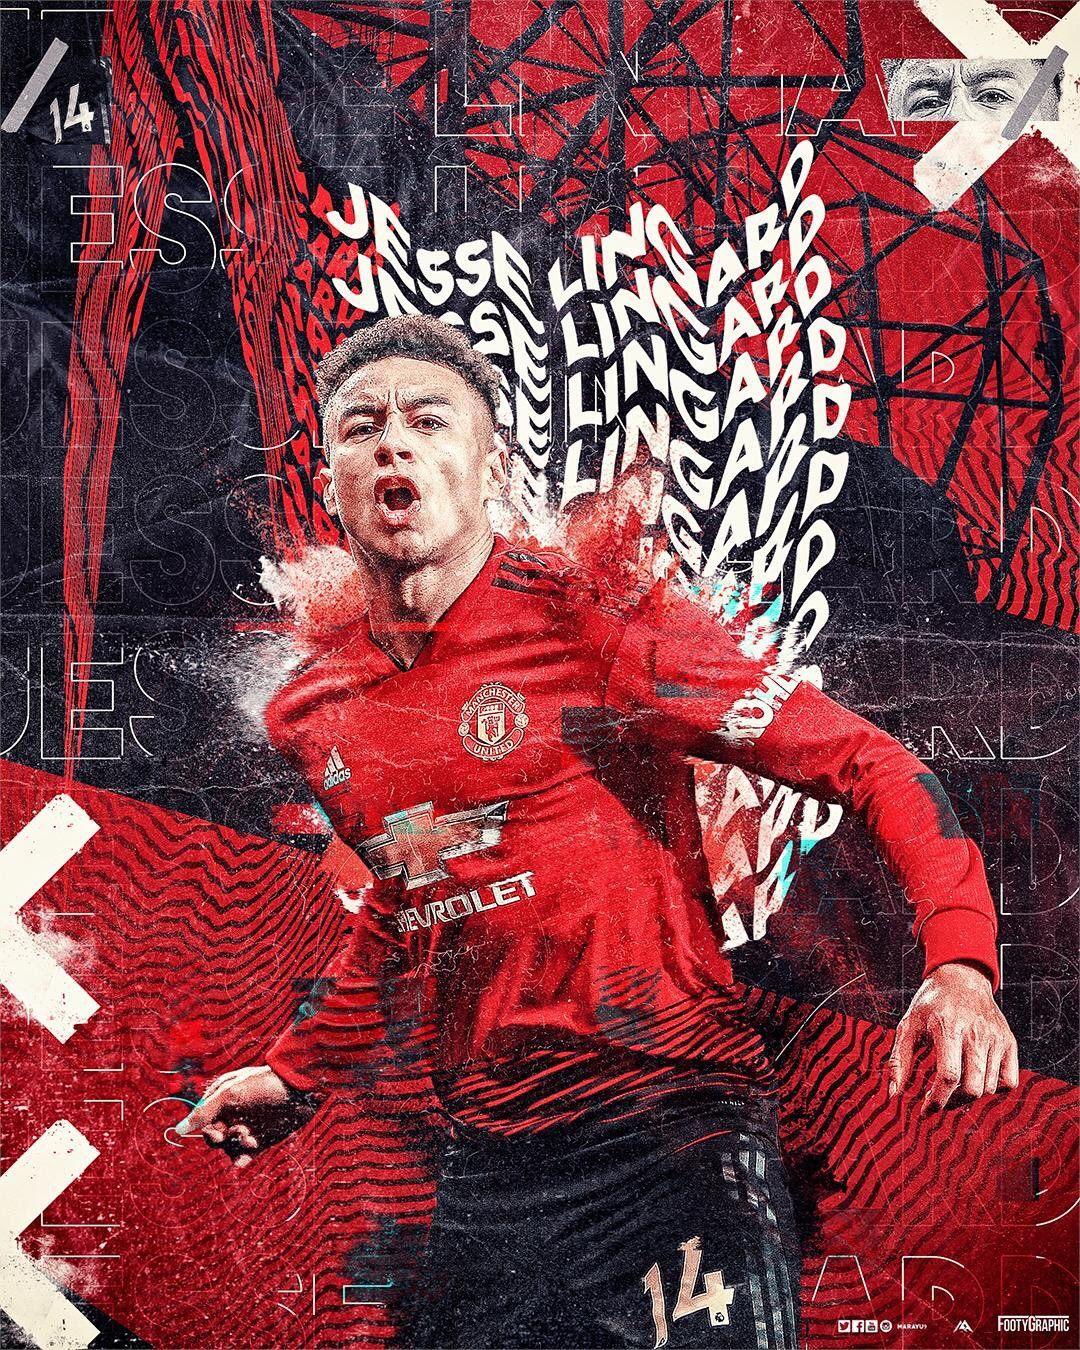 Poddesign On Twitter In 2020 Football Design Manchester United Wallpaper Sports Graphic Design